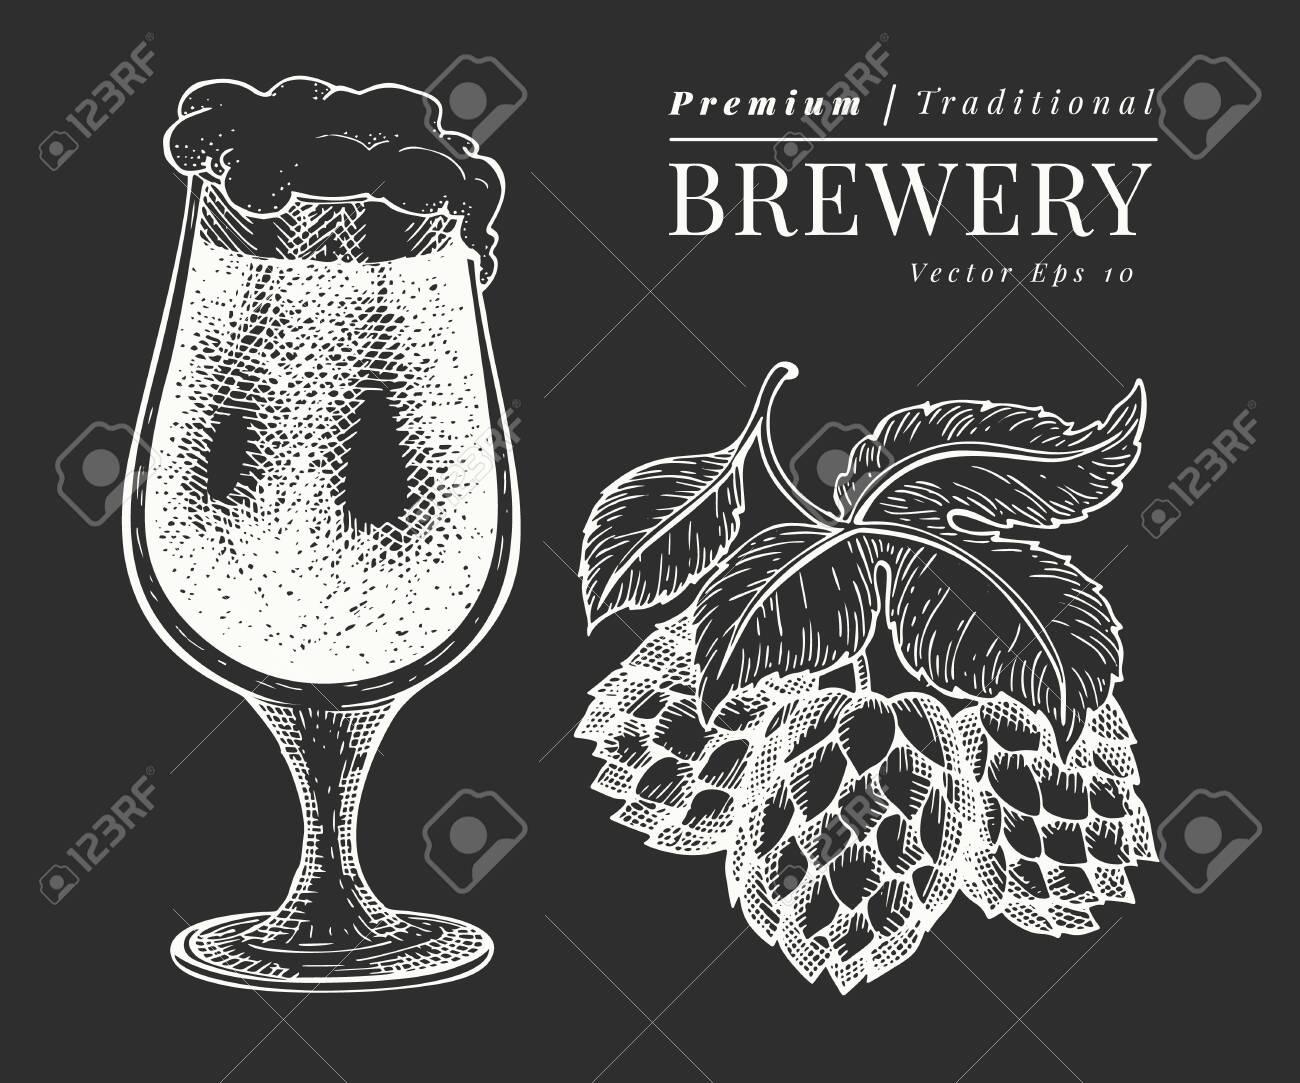 Beer glass and hop illustration. Hand drawn vector pub beverage illustration on chalk board. Engraved style. Vintage brewery illustration. - 137501269